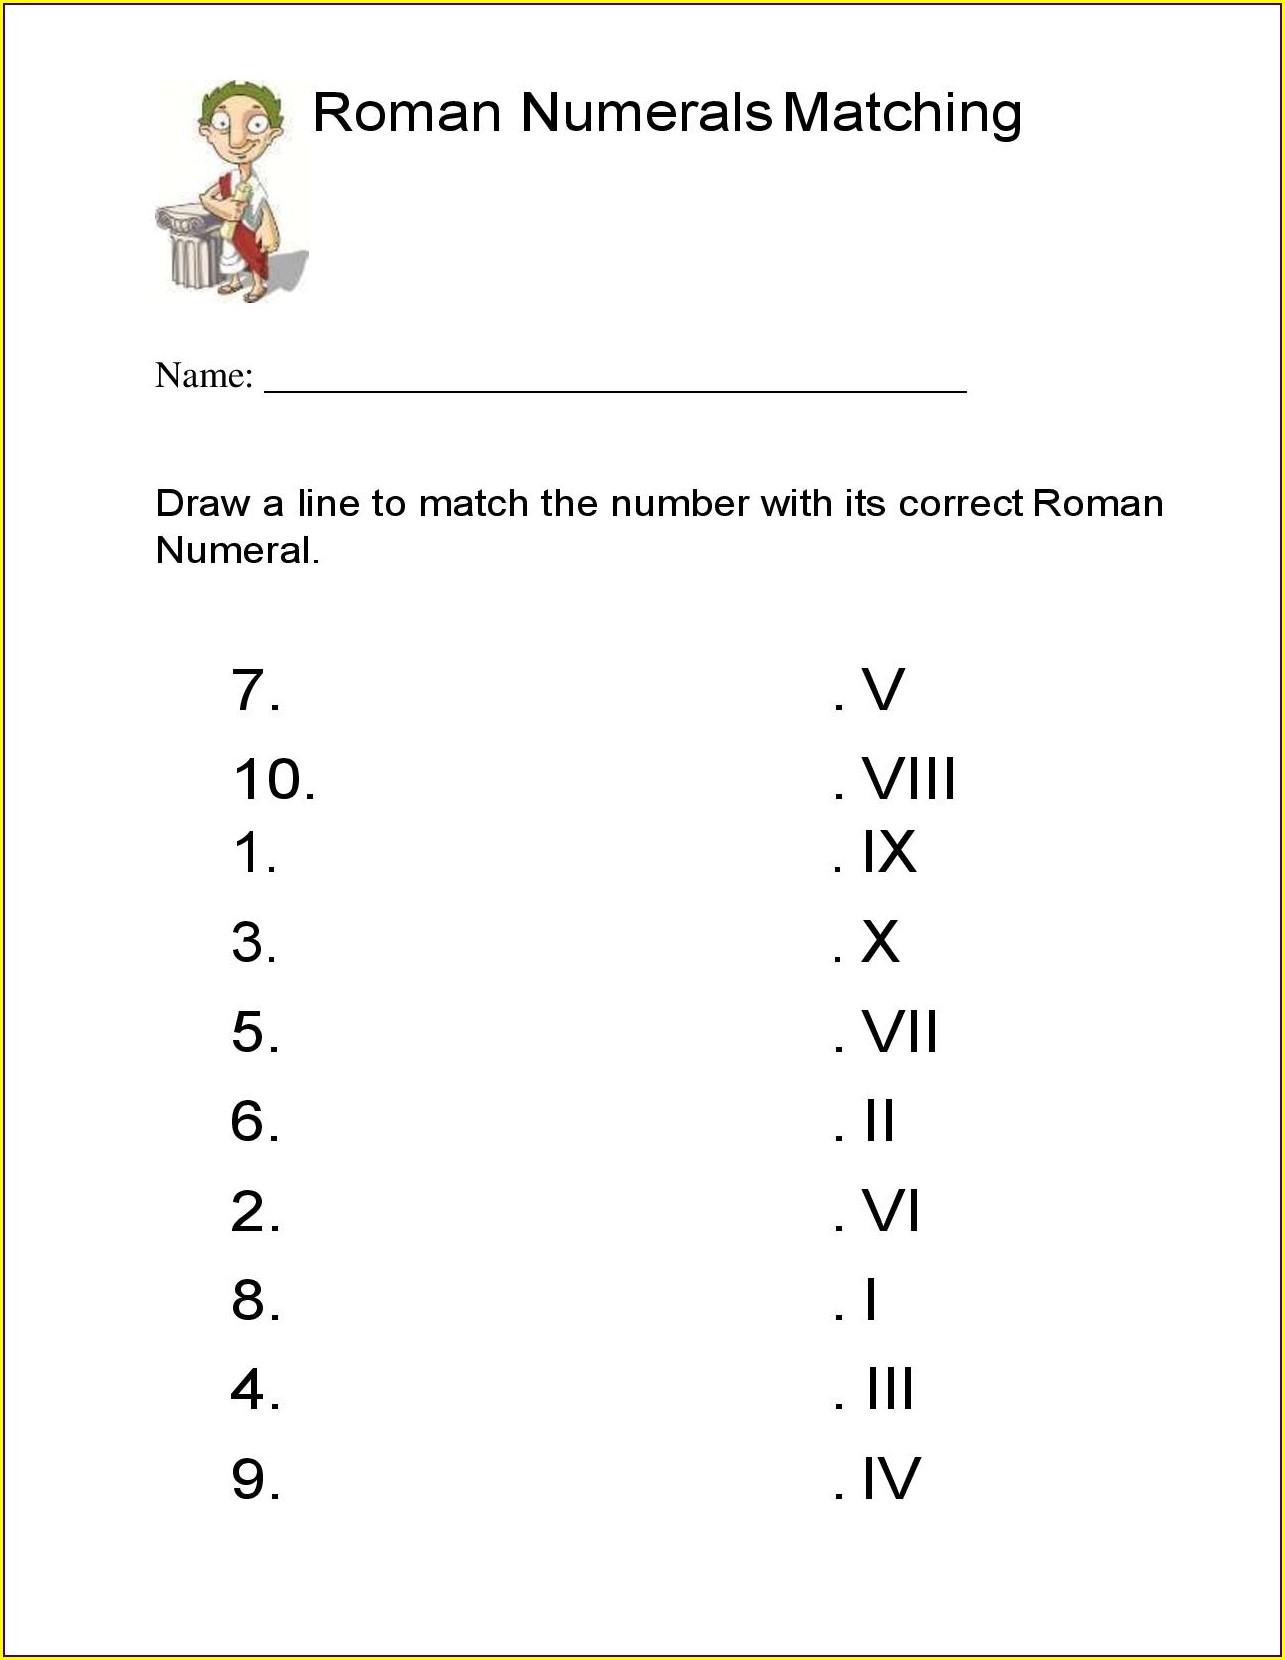 Roman Numerals Code Worksheet